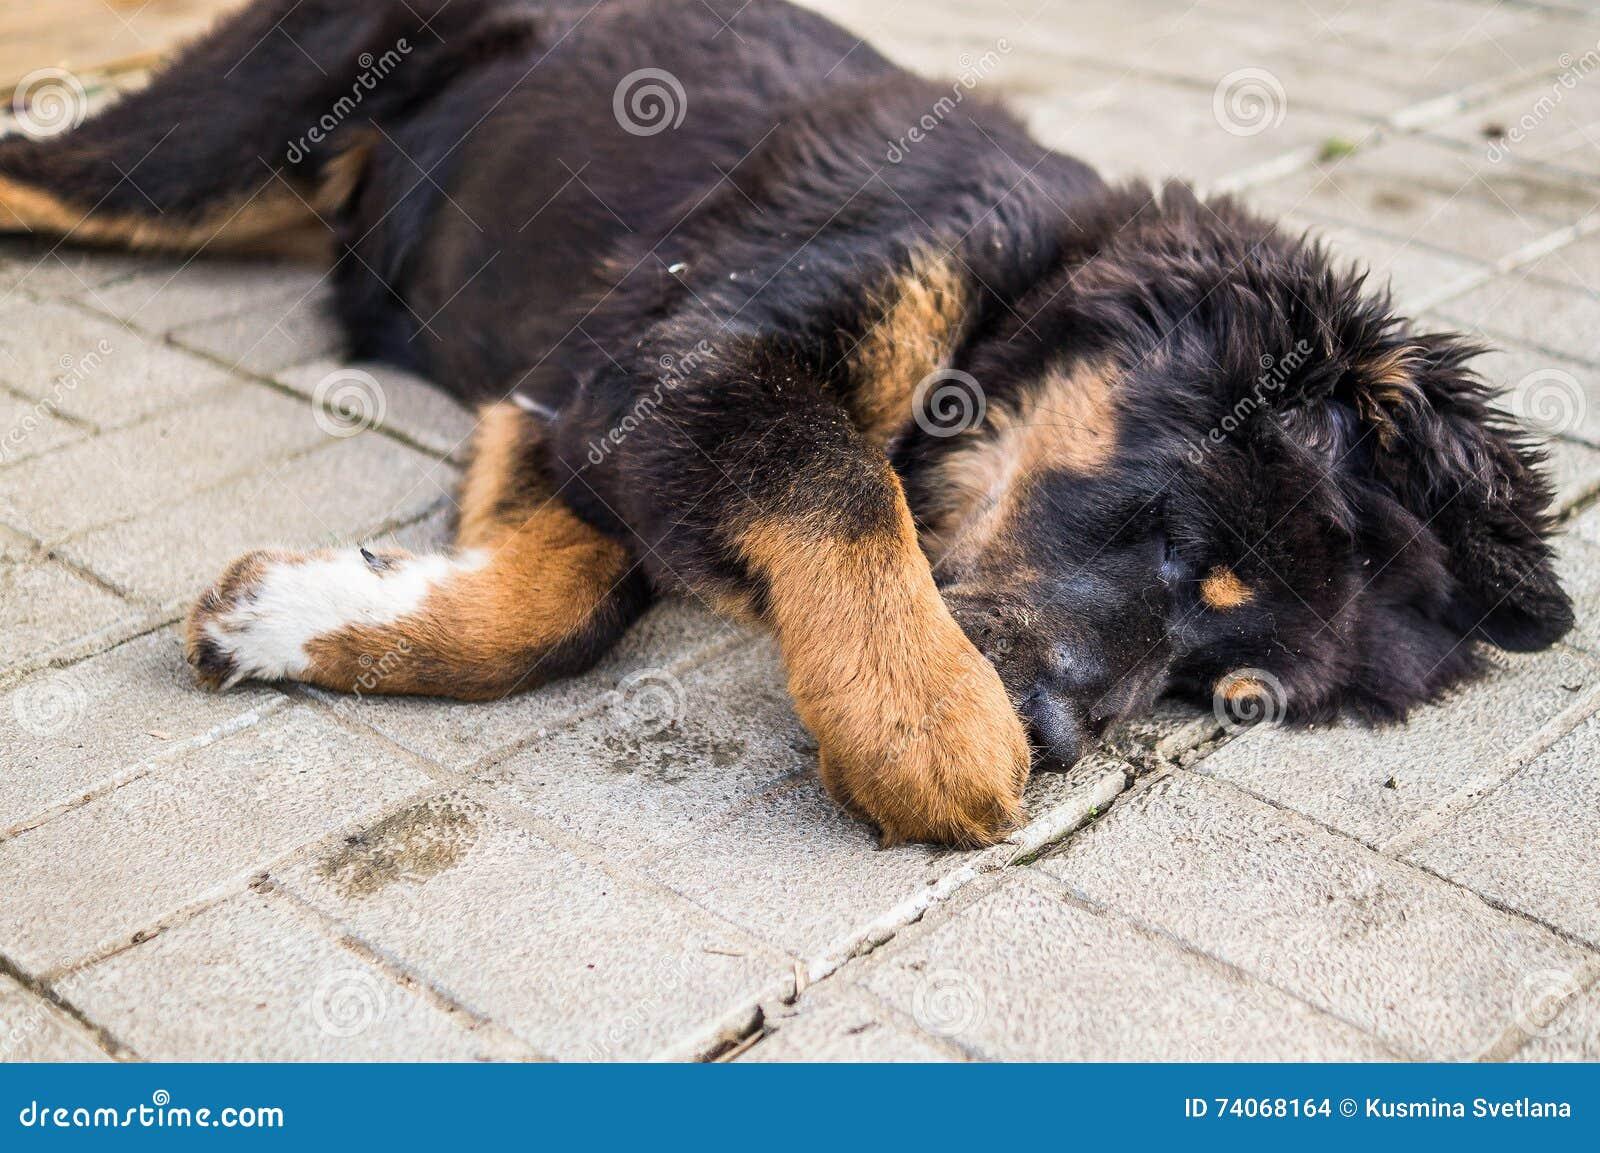 Playing the tibetan mastiff puppy the tibetan mastiff is one of the